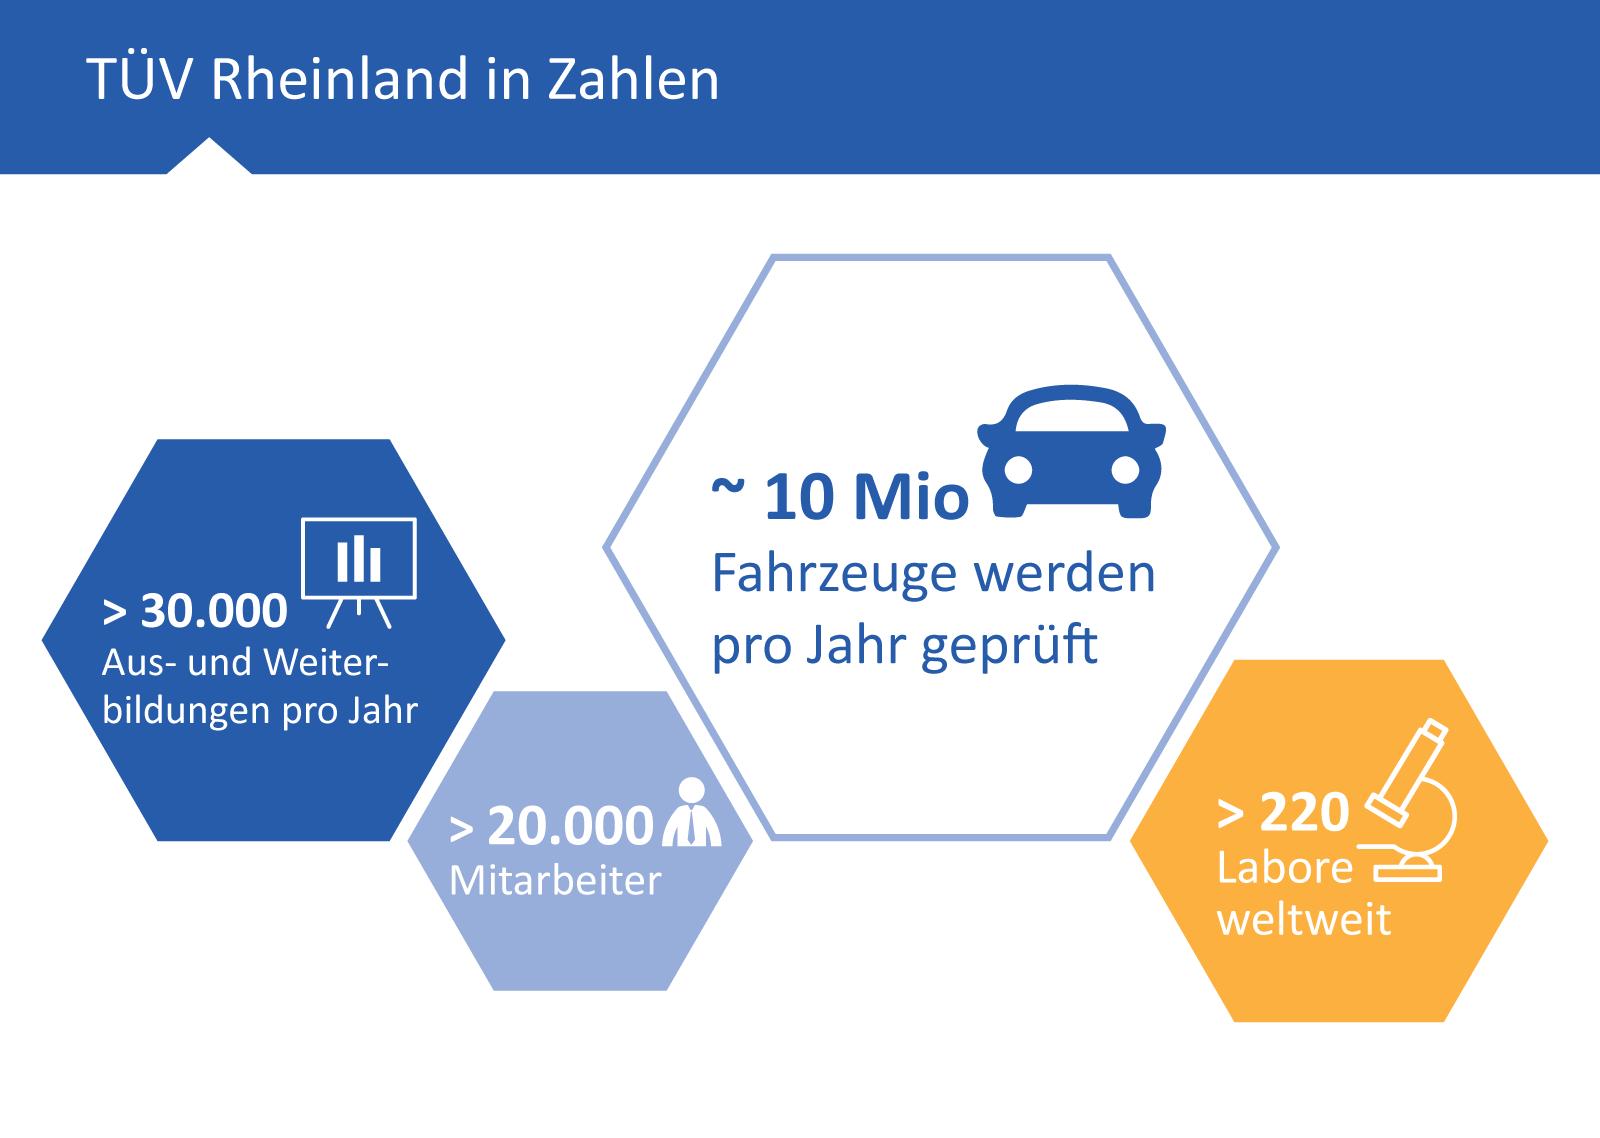 Portrino Referenz: TÜV Rheinland in Zahlen